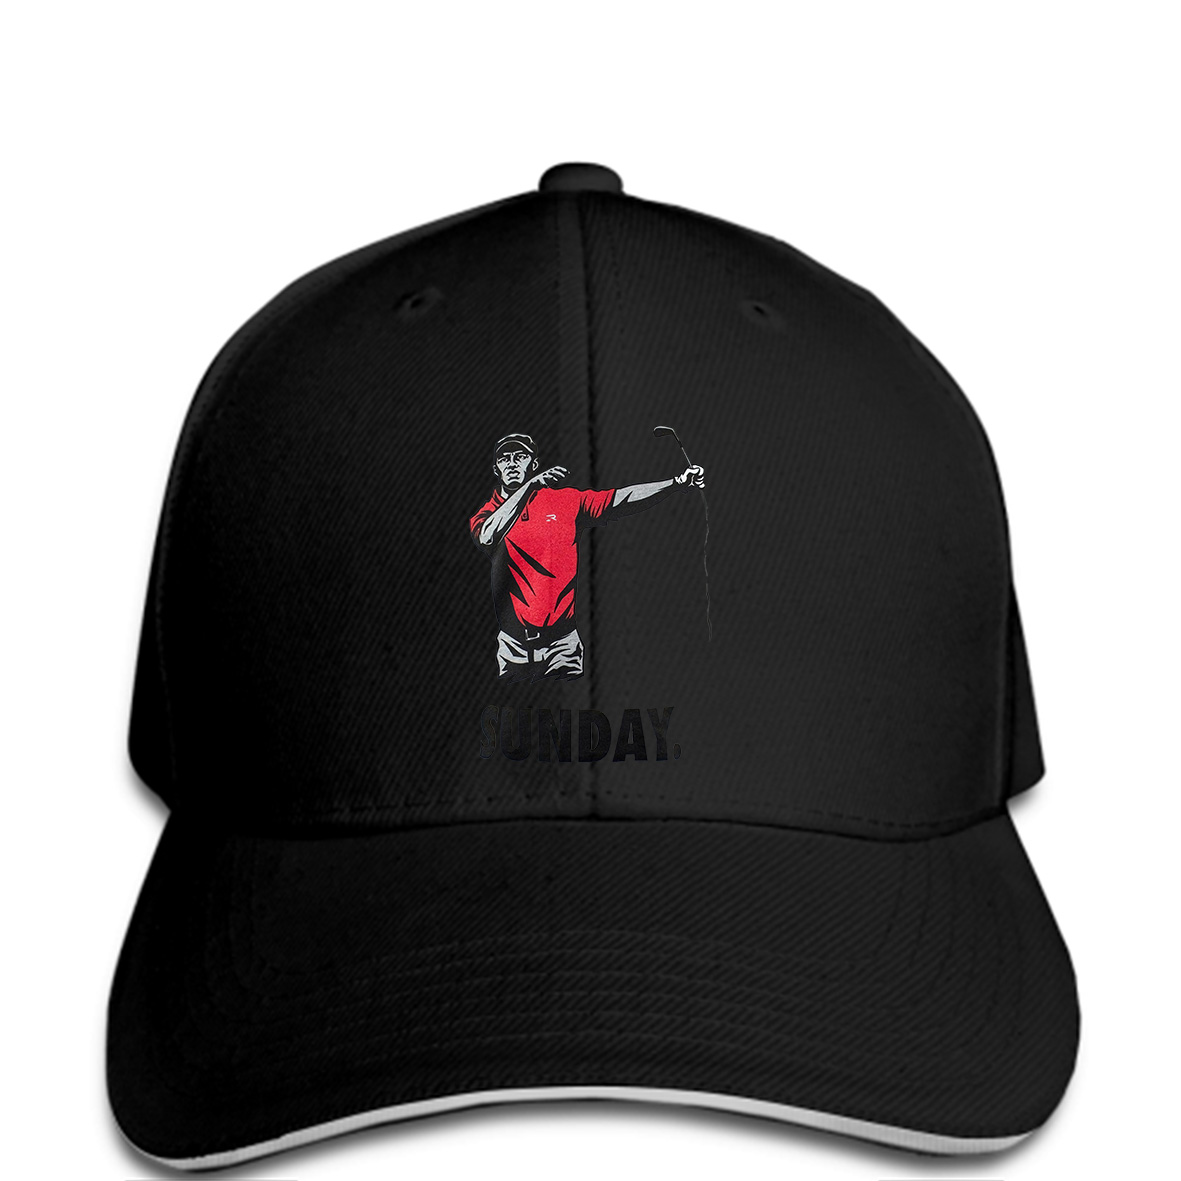 Men Baseball cap New Rool Golfs Tiger Woods Sunday Golf X large Fashion Hat  novelty tsnapback women 40c3a1cd4e5